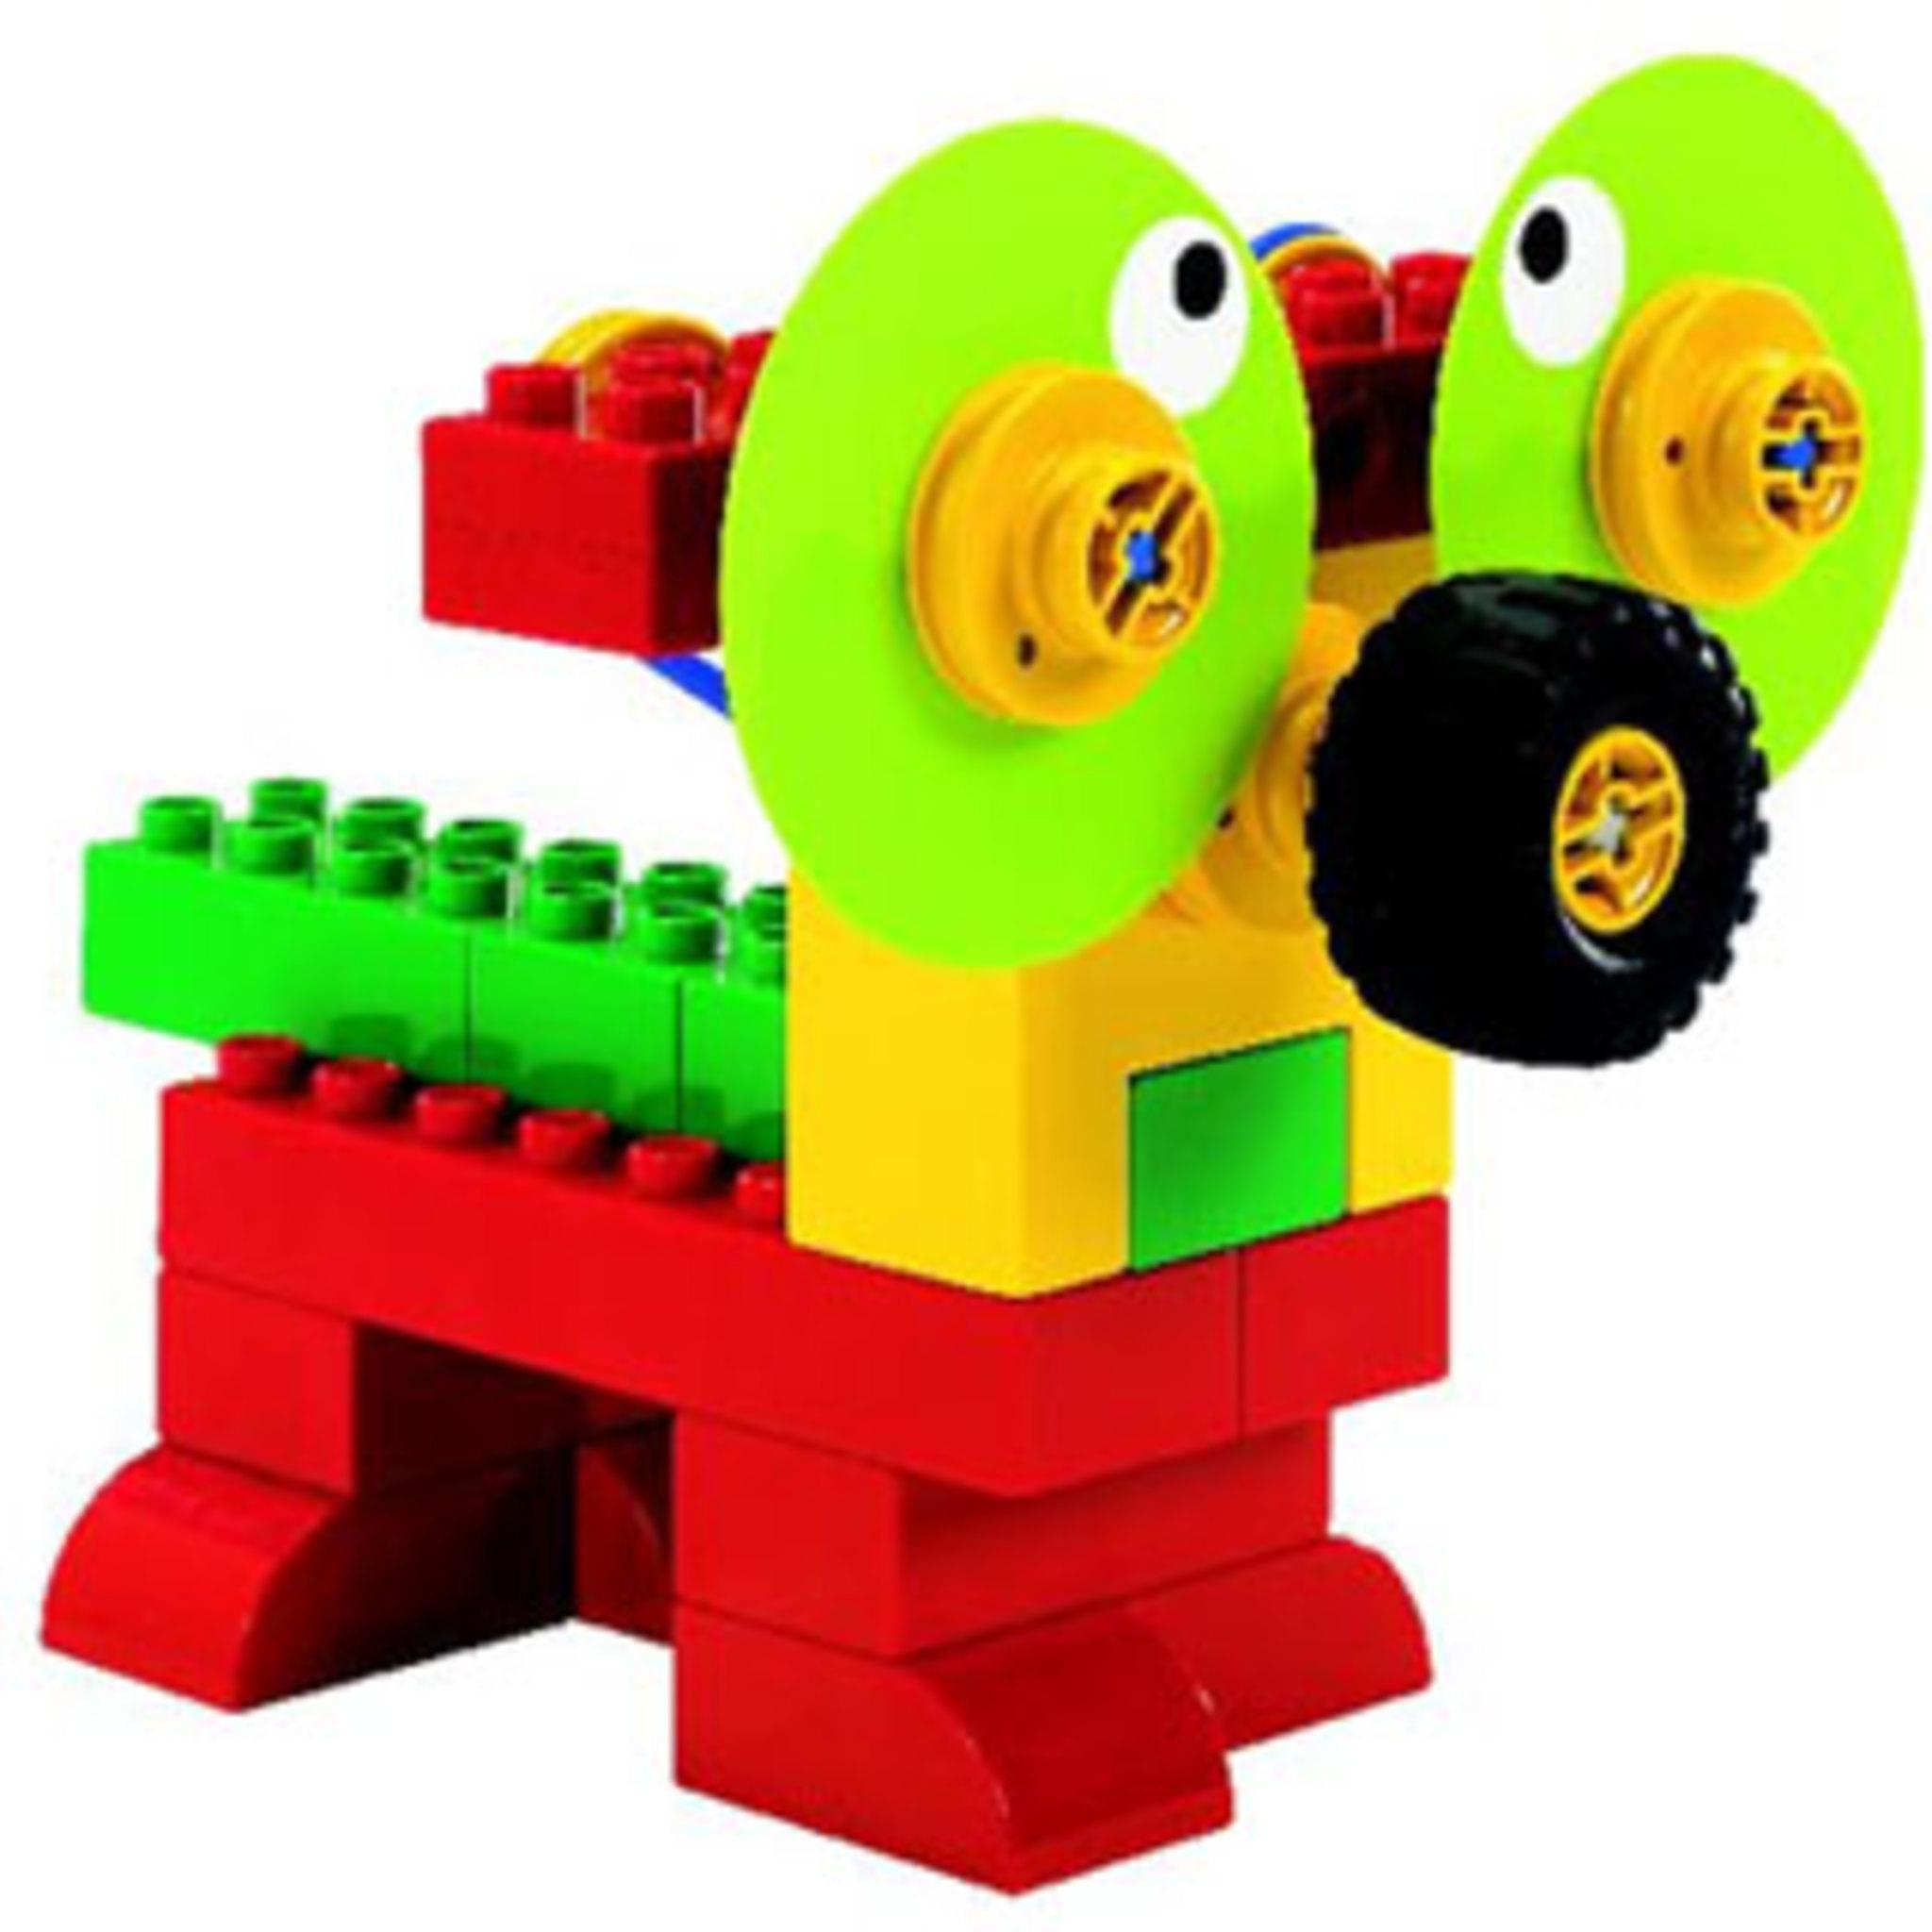 LEGO Education 9656 - Early Simple Machines Set | Mattonito